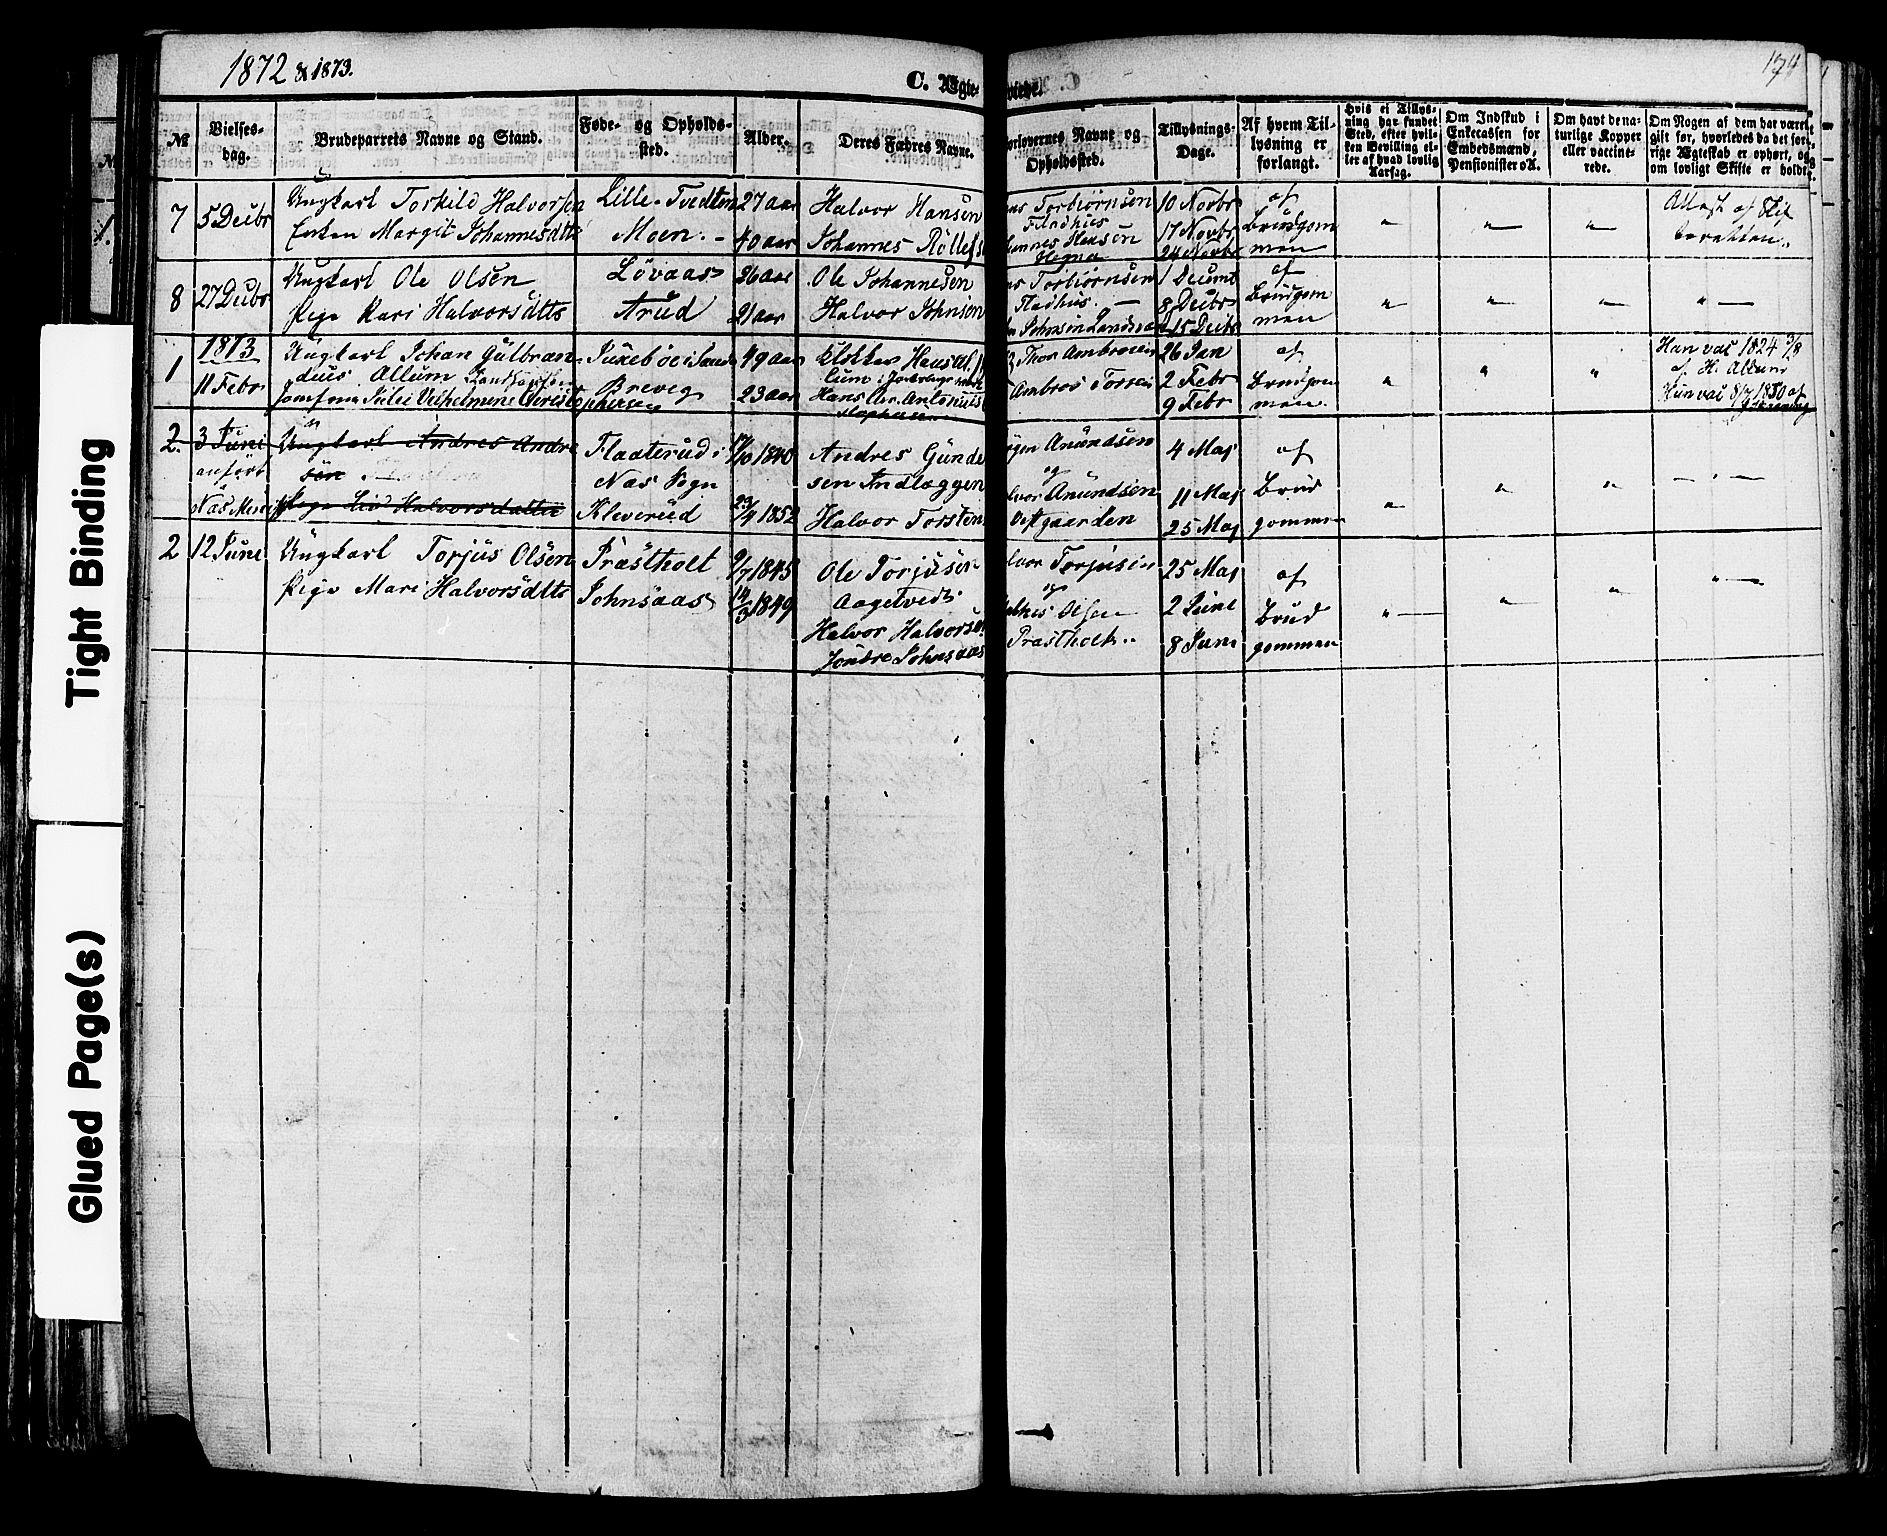 SAKO, Sauherad kirkebøker, F/Fa/L0007: Ministerialbok nr. I 7, 1851-1873, s. 174